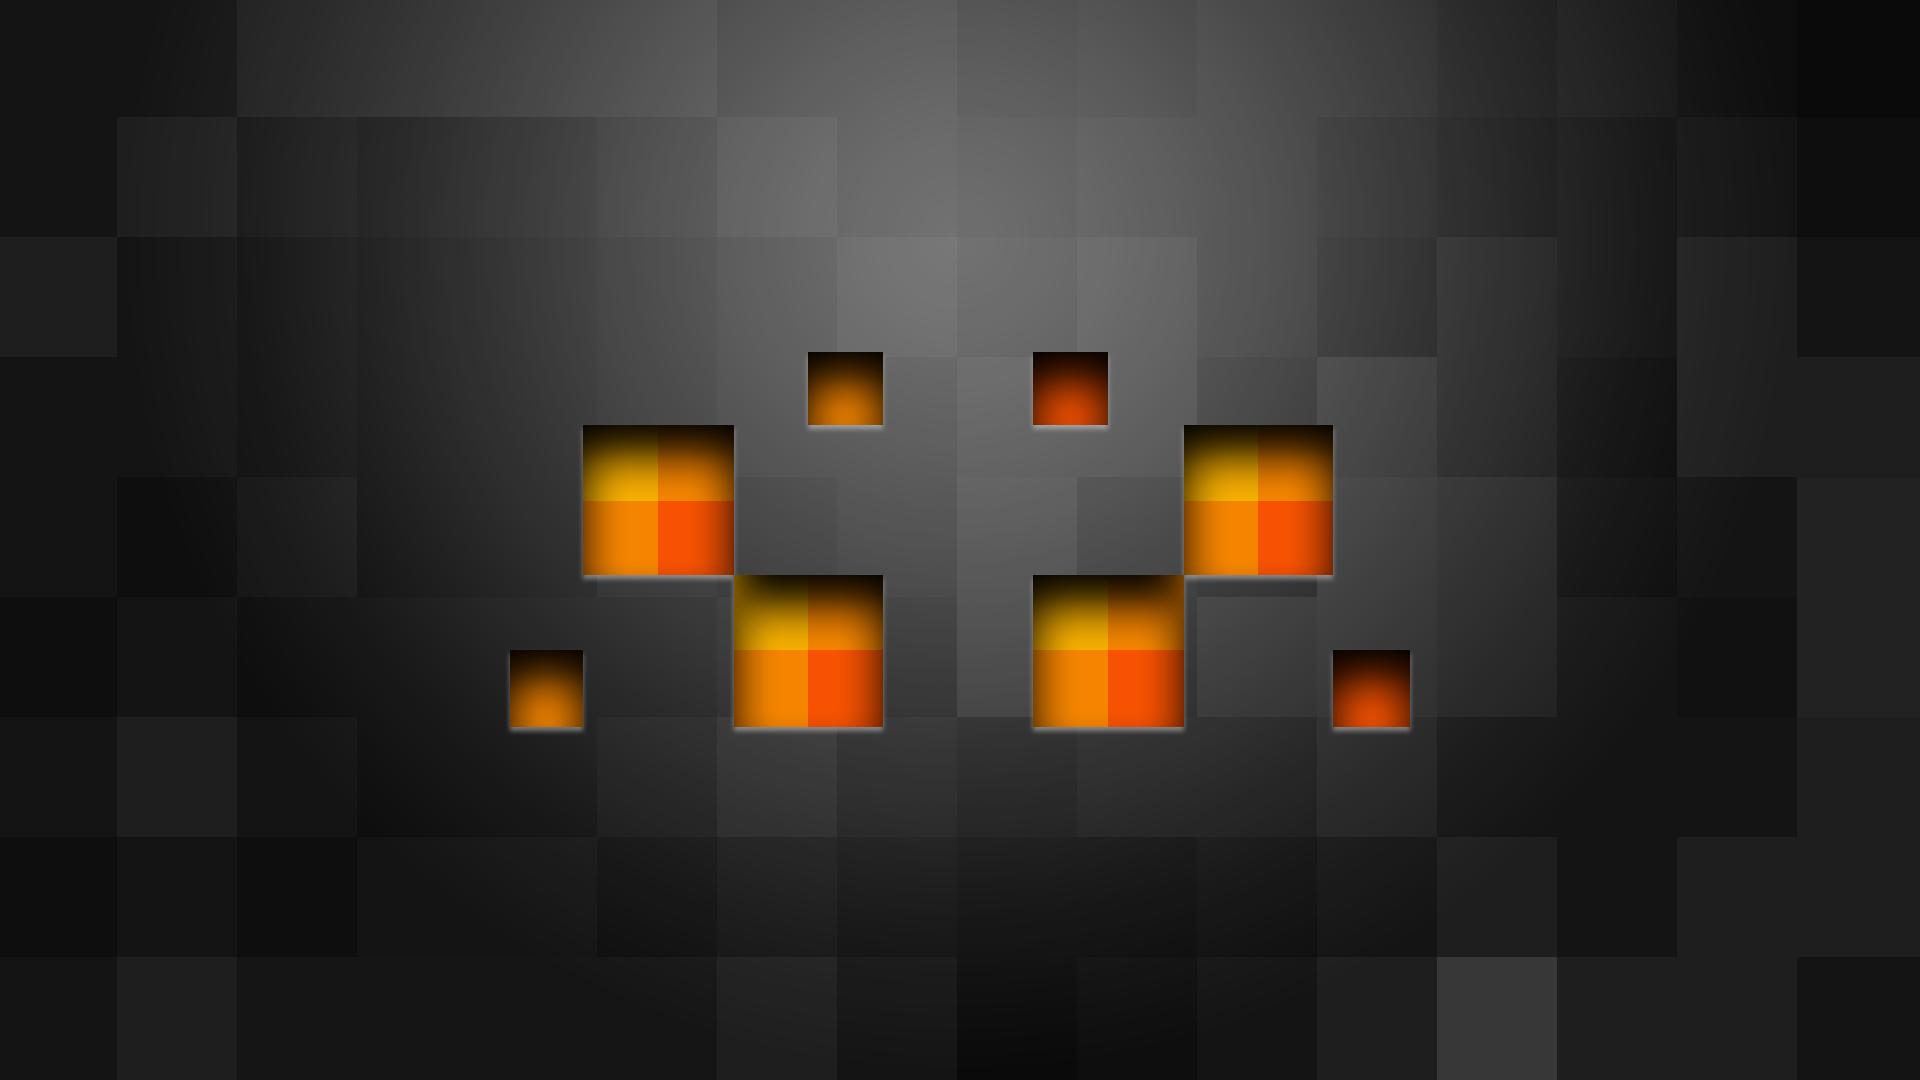 Fantastic Wallpaper Minecraft Home Screen - minecraft-spider  Trends_302281.png